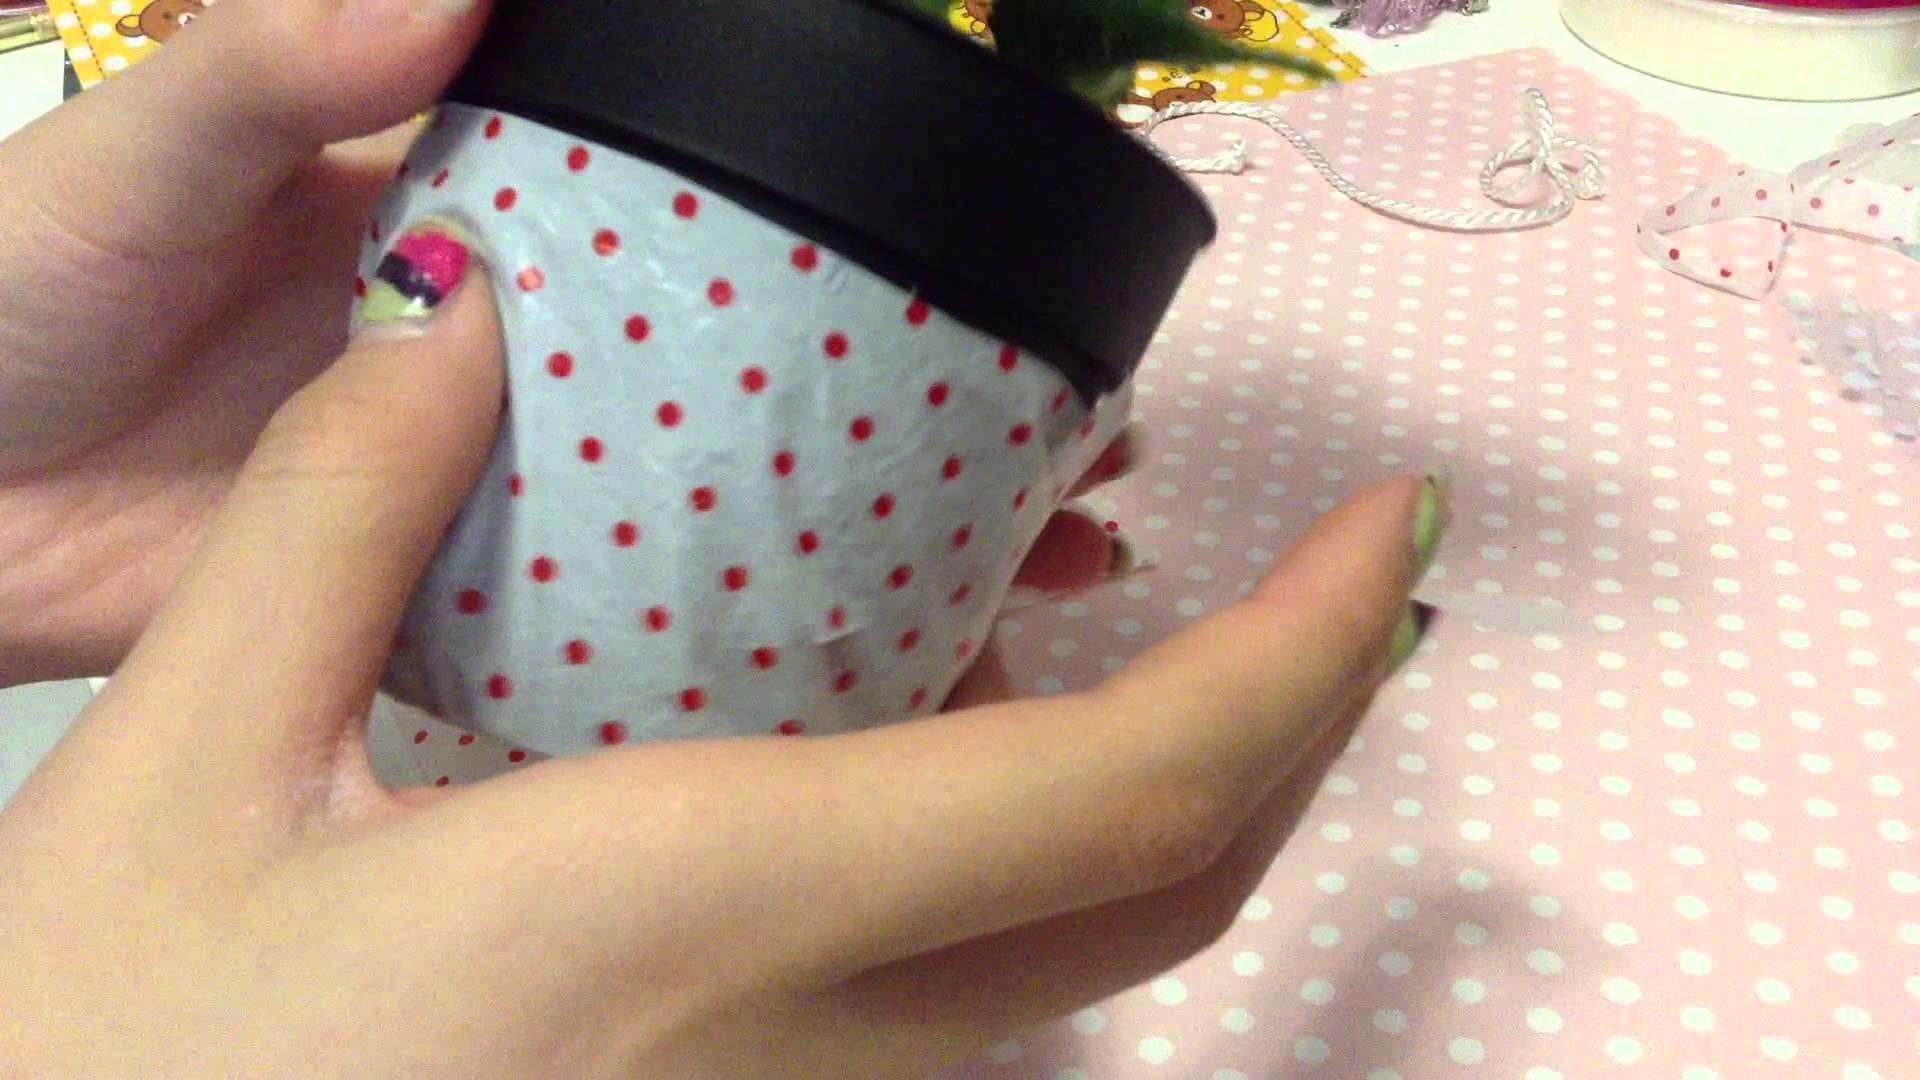 DIY Decorating Flower Pot (with a plastic bag!!)